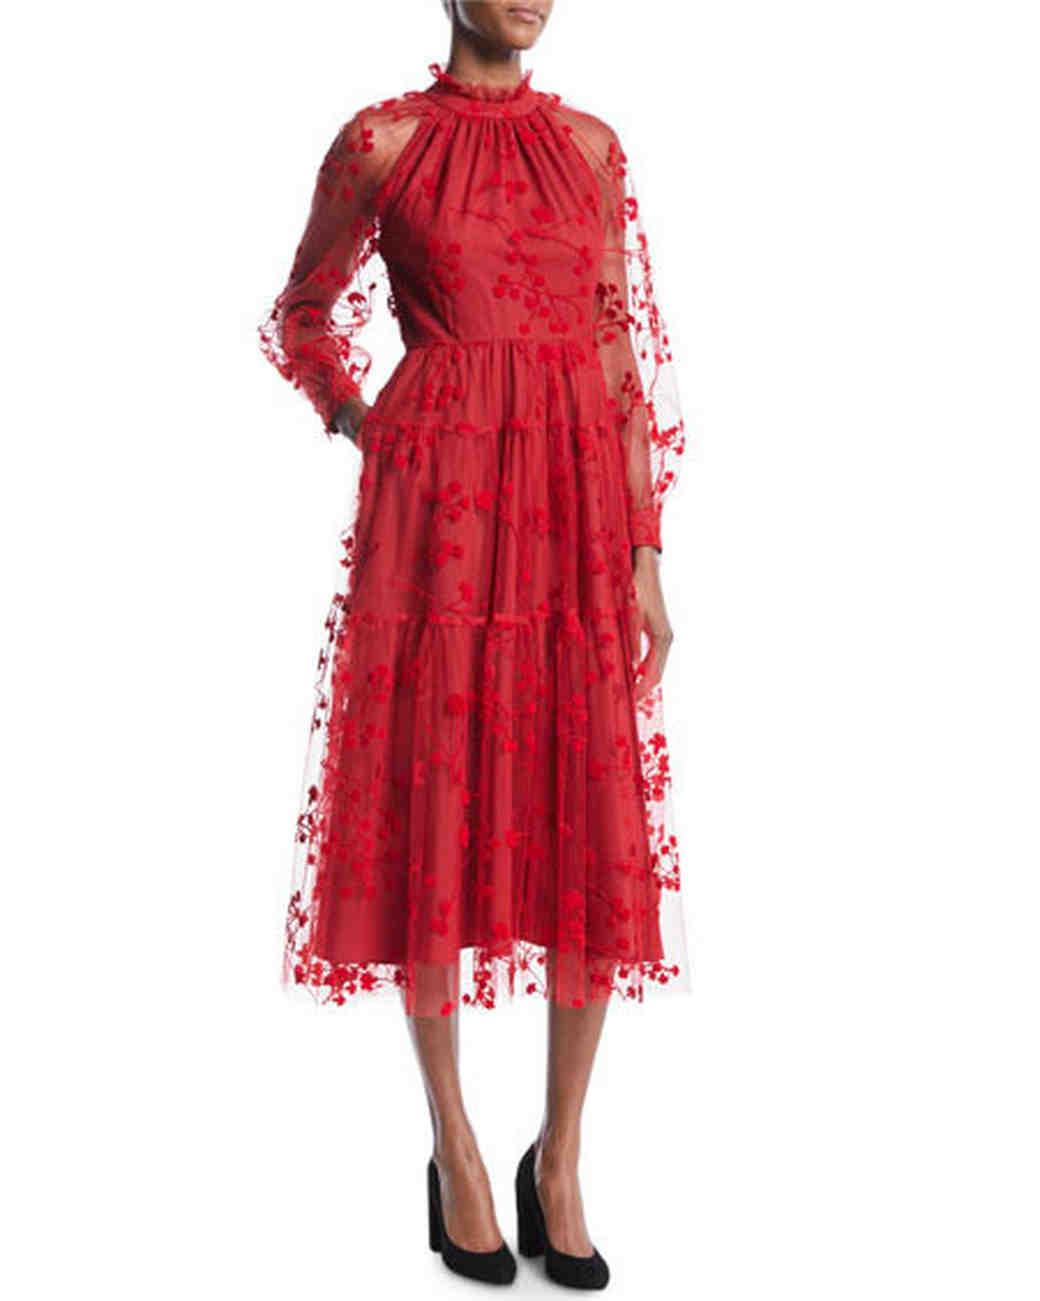 Talbots Dresses For Weddings